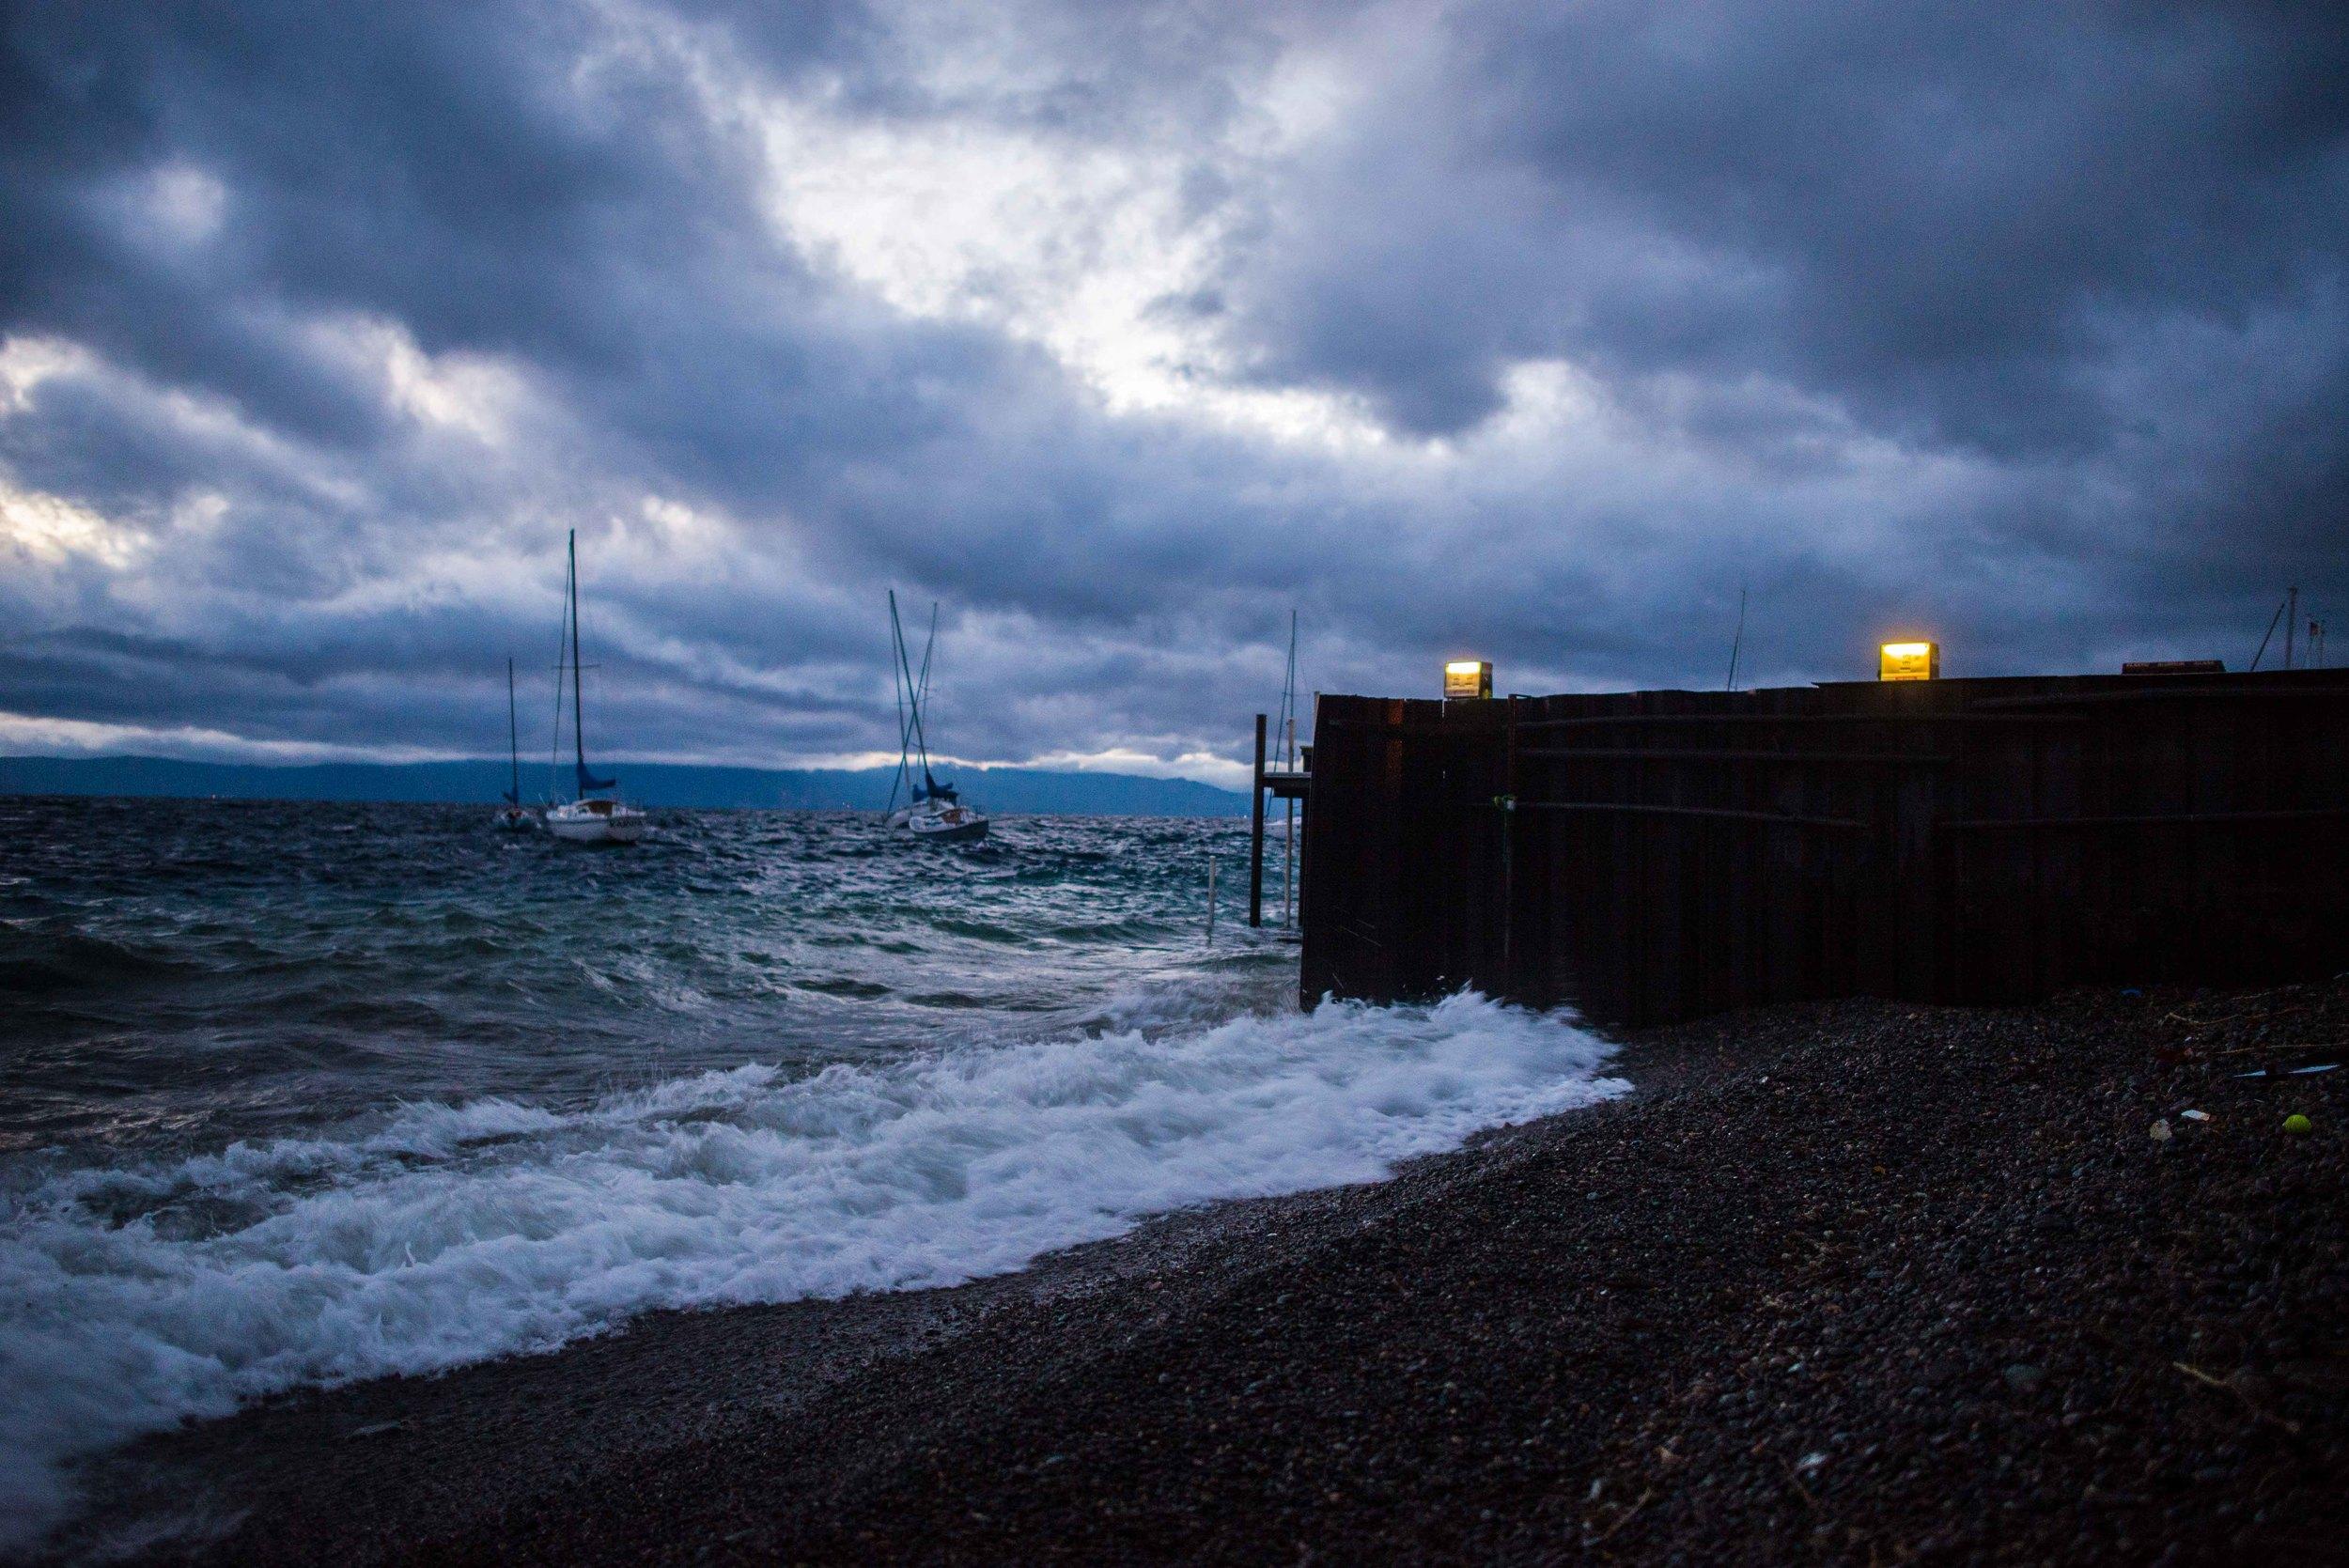 rough seas, dim light